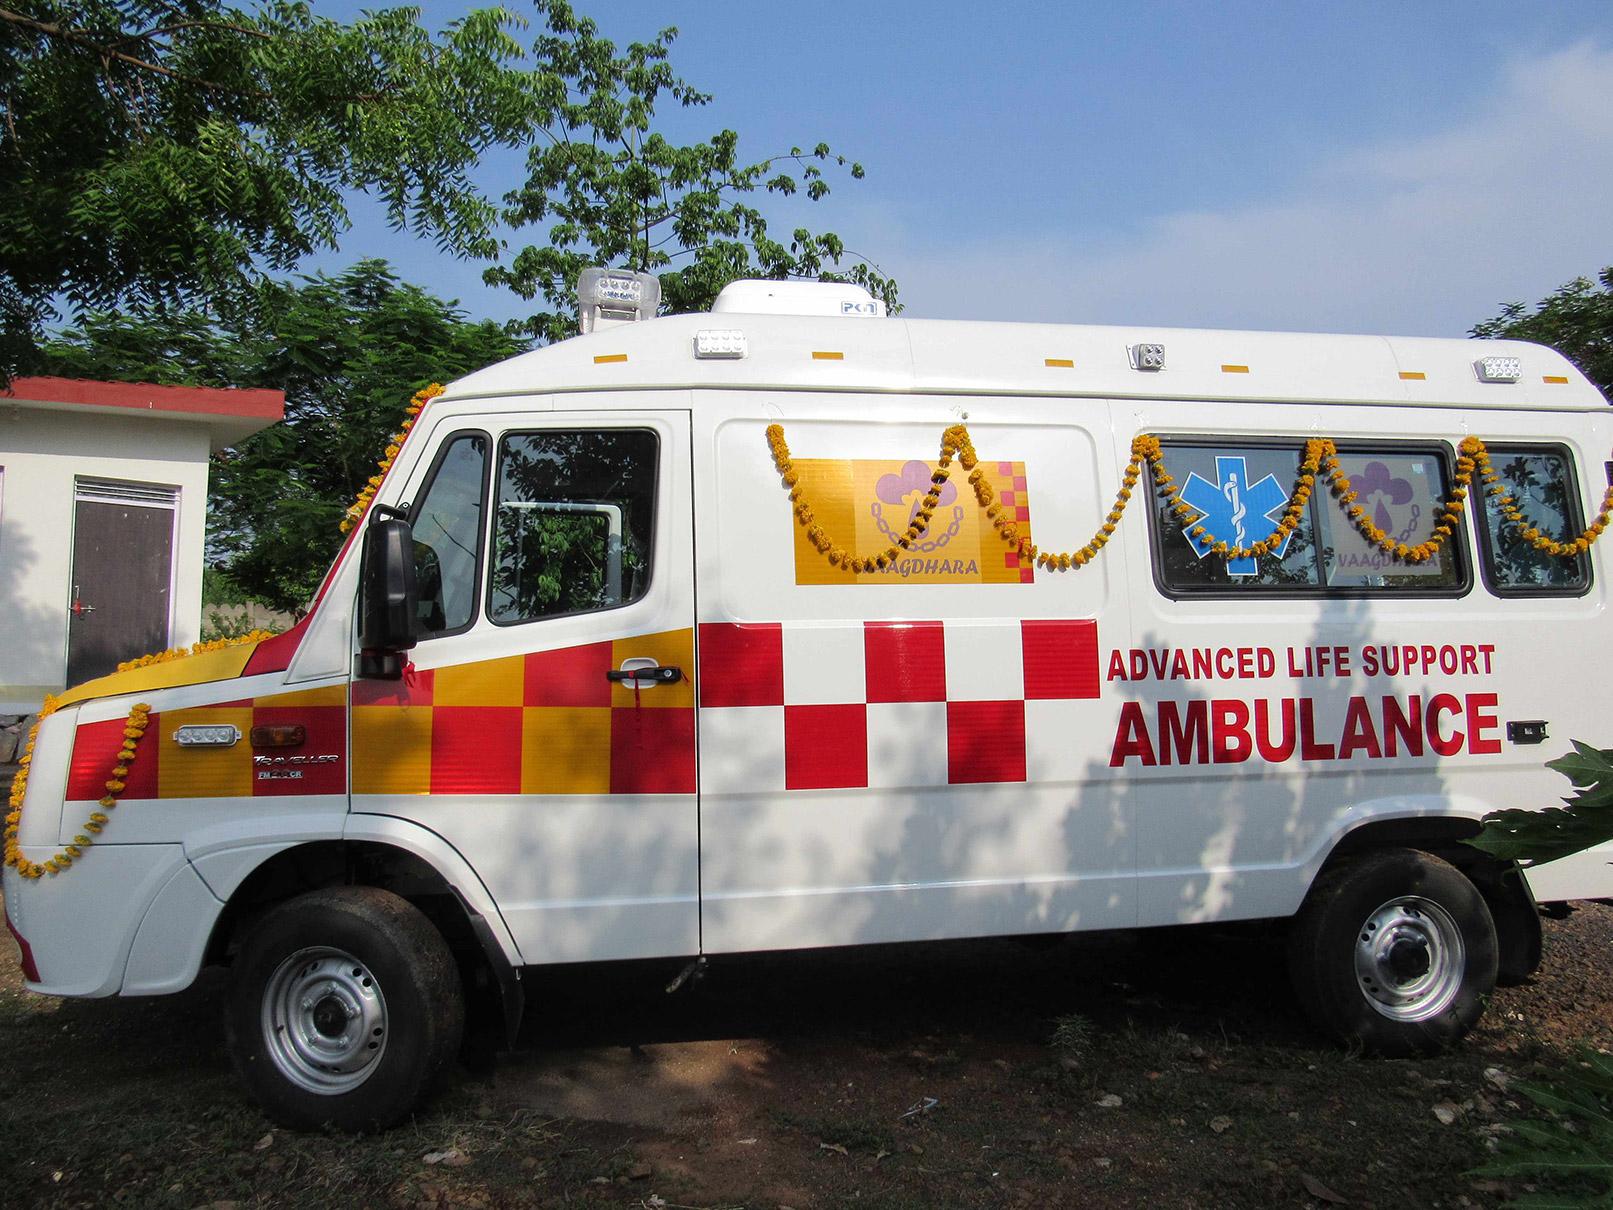 vaagdhara-ambulance-service-for-community-5